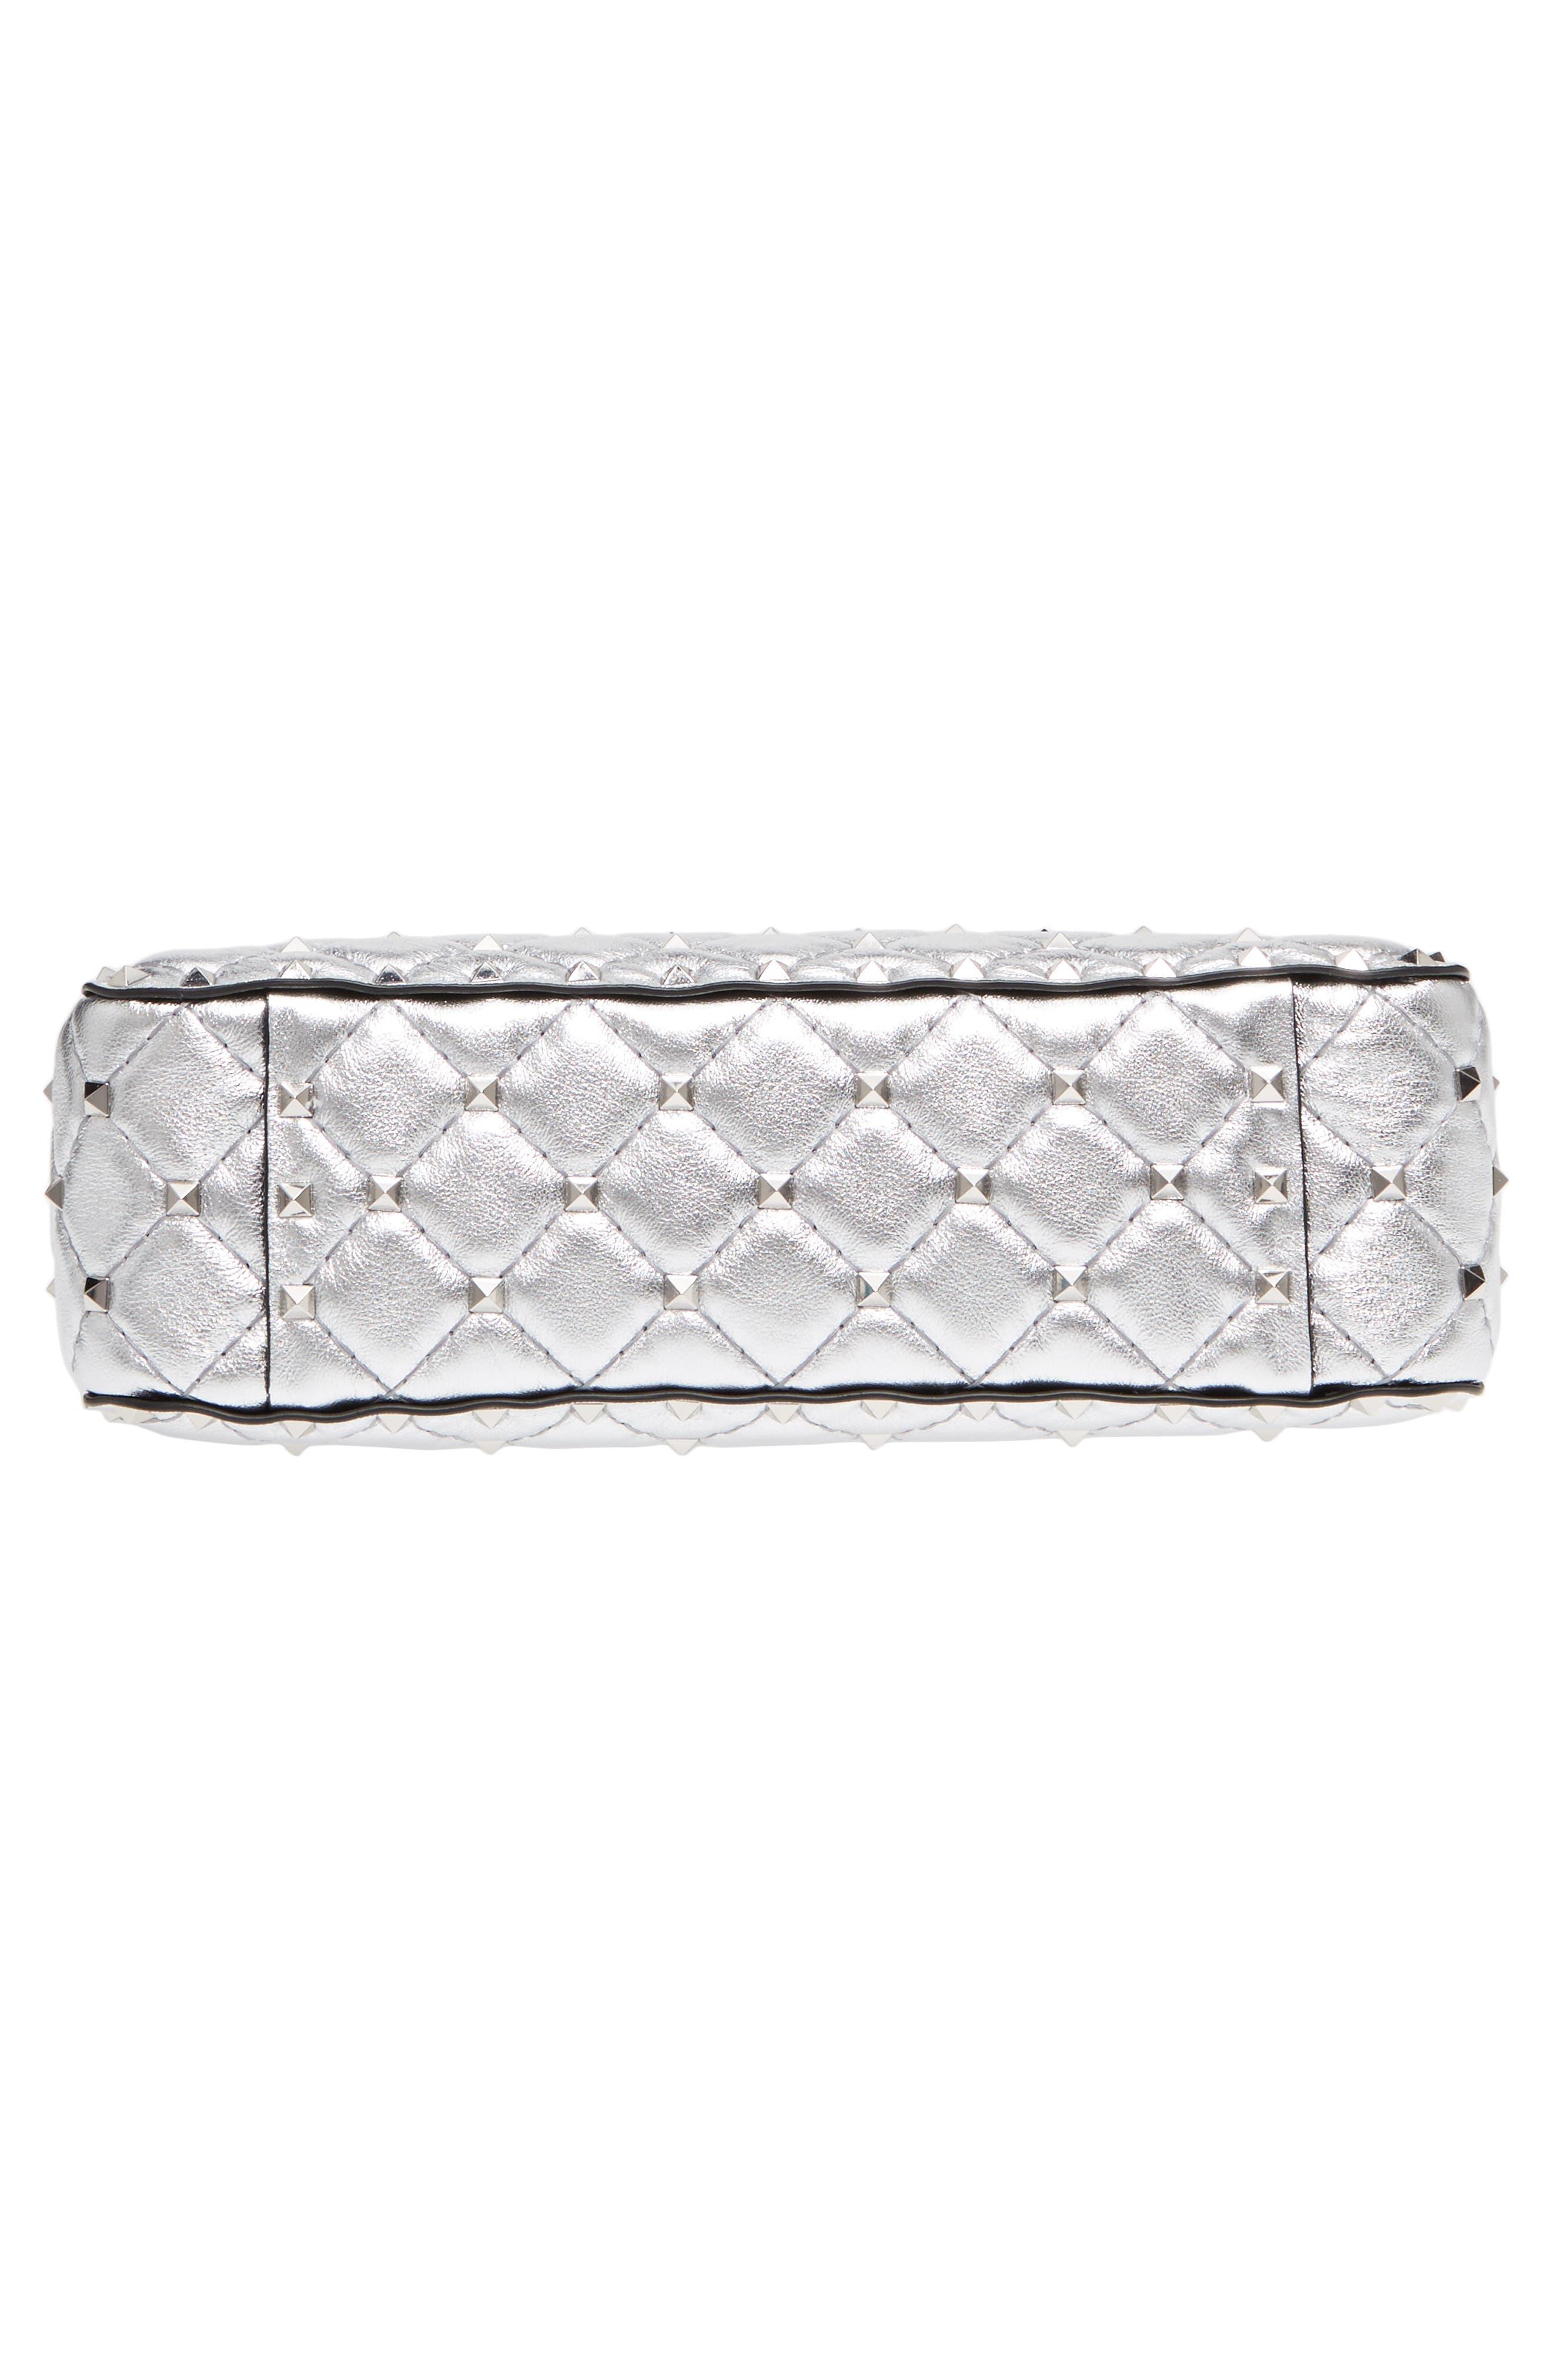 Medium Rockstud Spike Metallic Leather Shoulder Bag,                             Alternate thumbnail 6, color,                             Silver